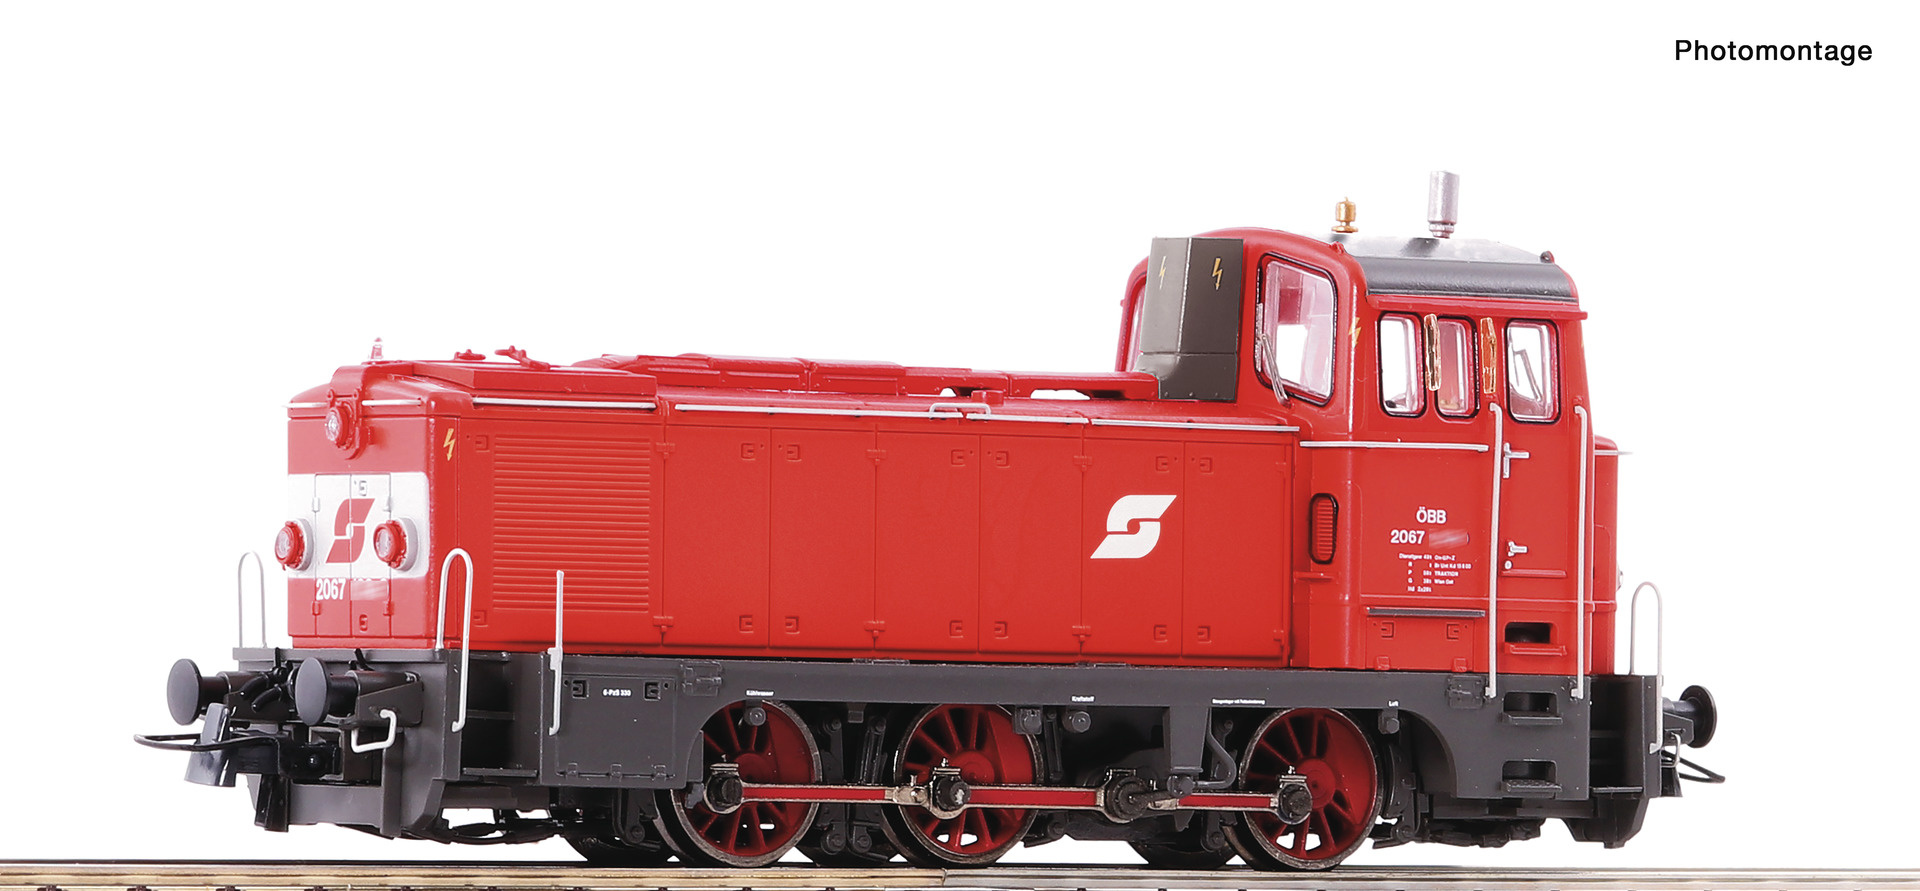 72911 Diesellok Rh 2067 ÖBB Snd.-1